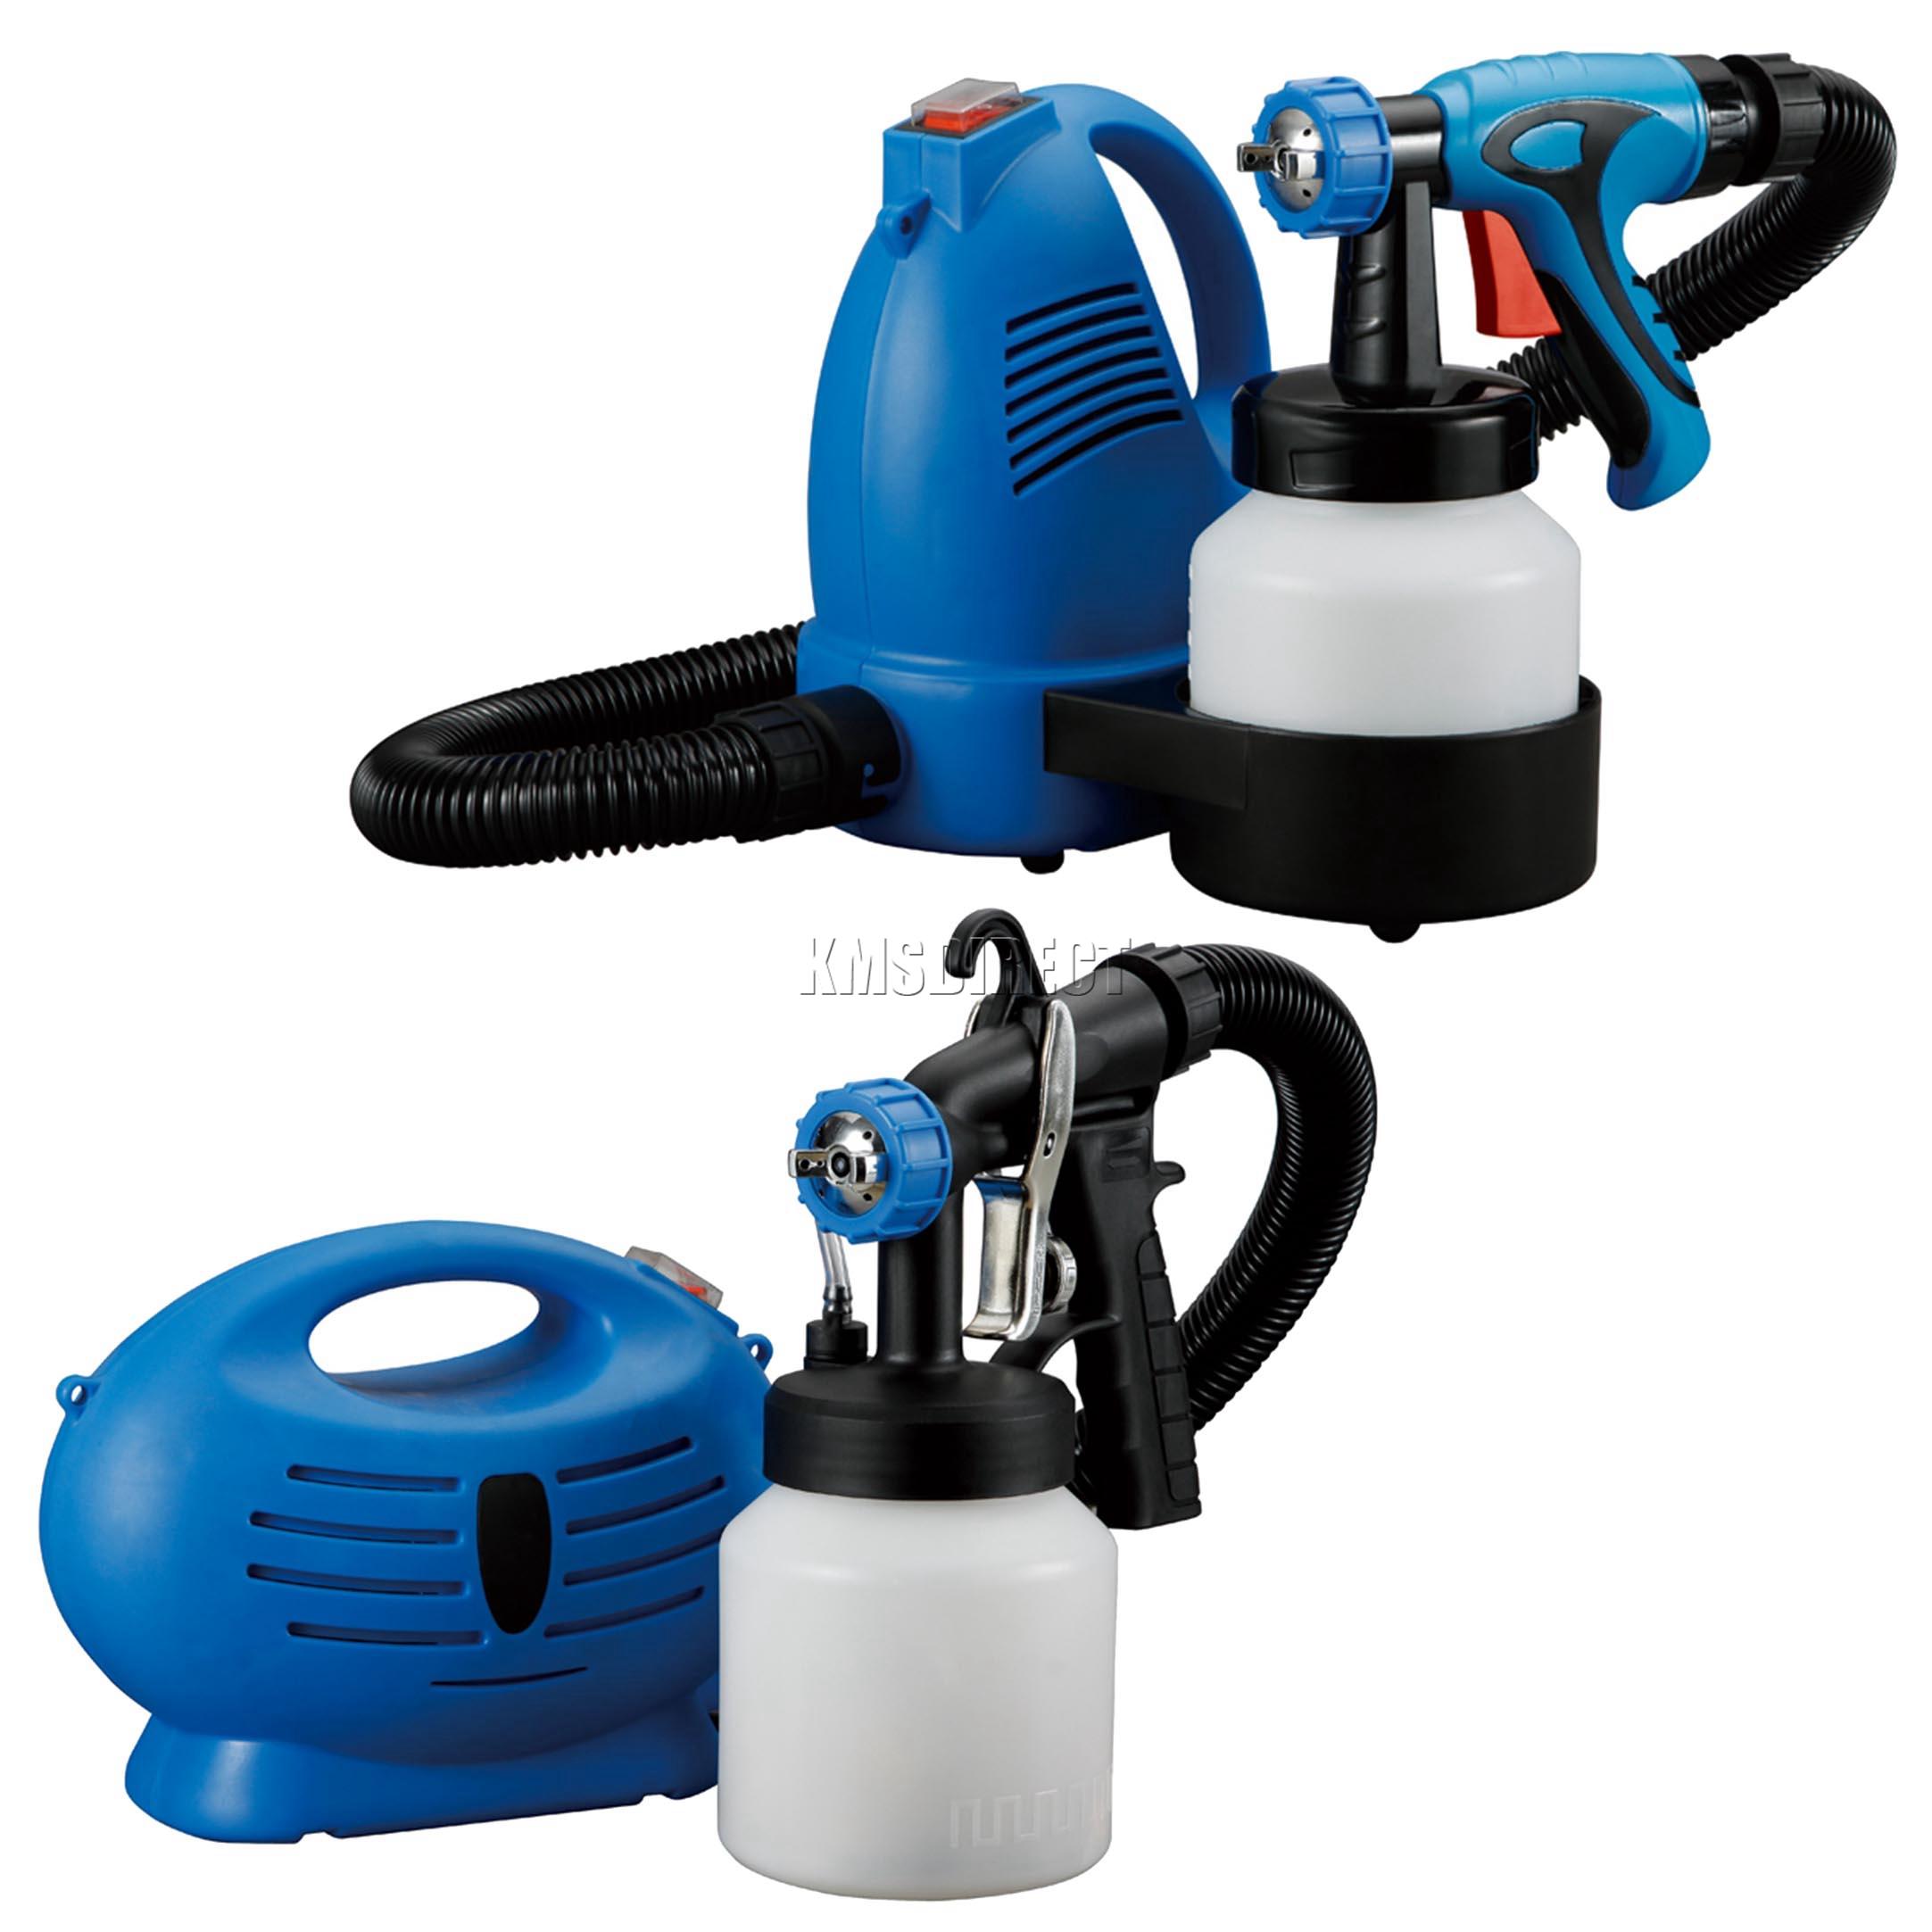 Best Electric Paint Sprayer Uk